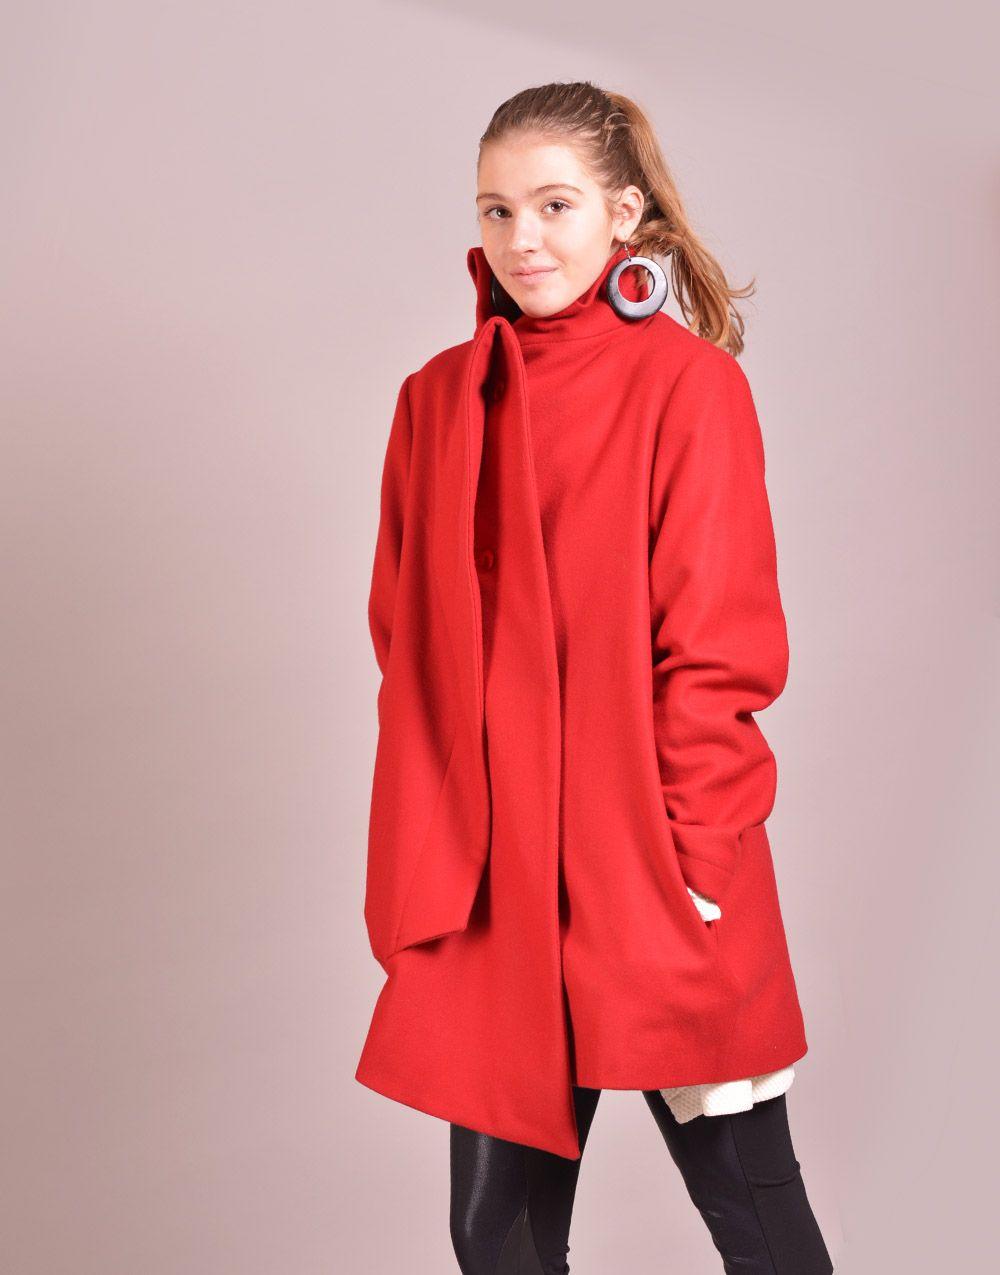 red coat, winter coat, women coat, wool coat, high collar coat